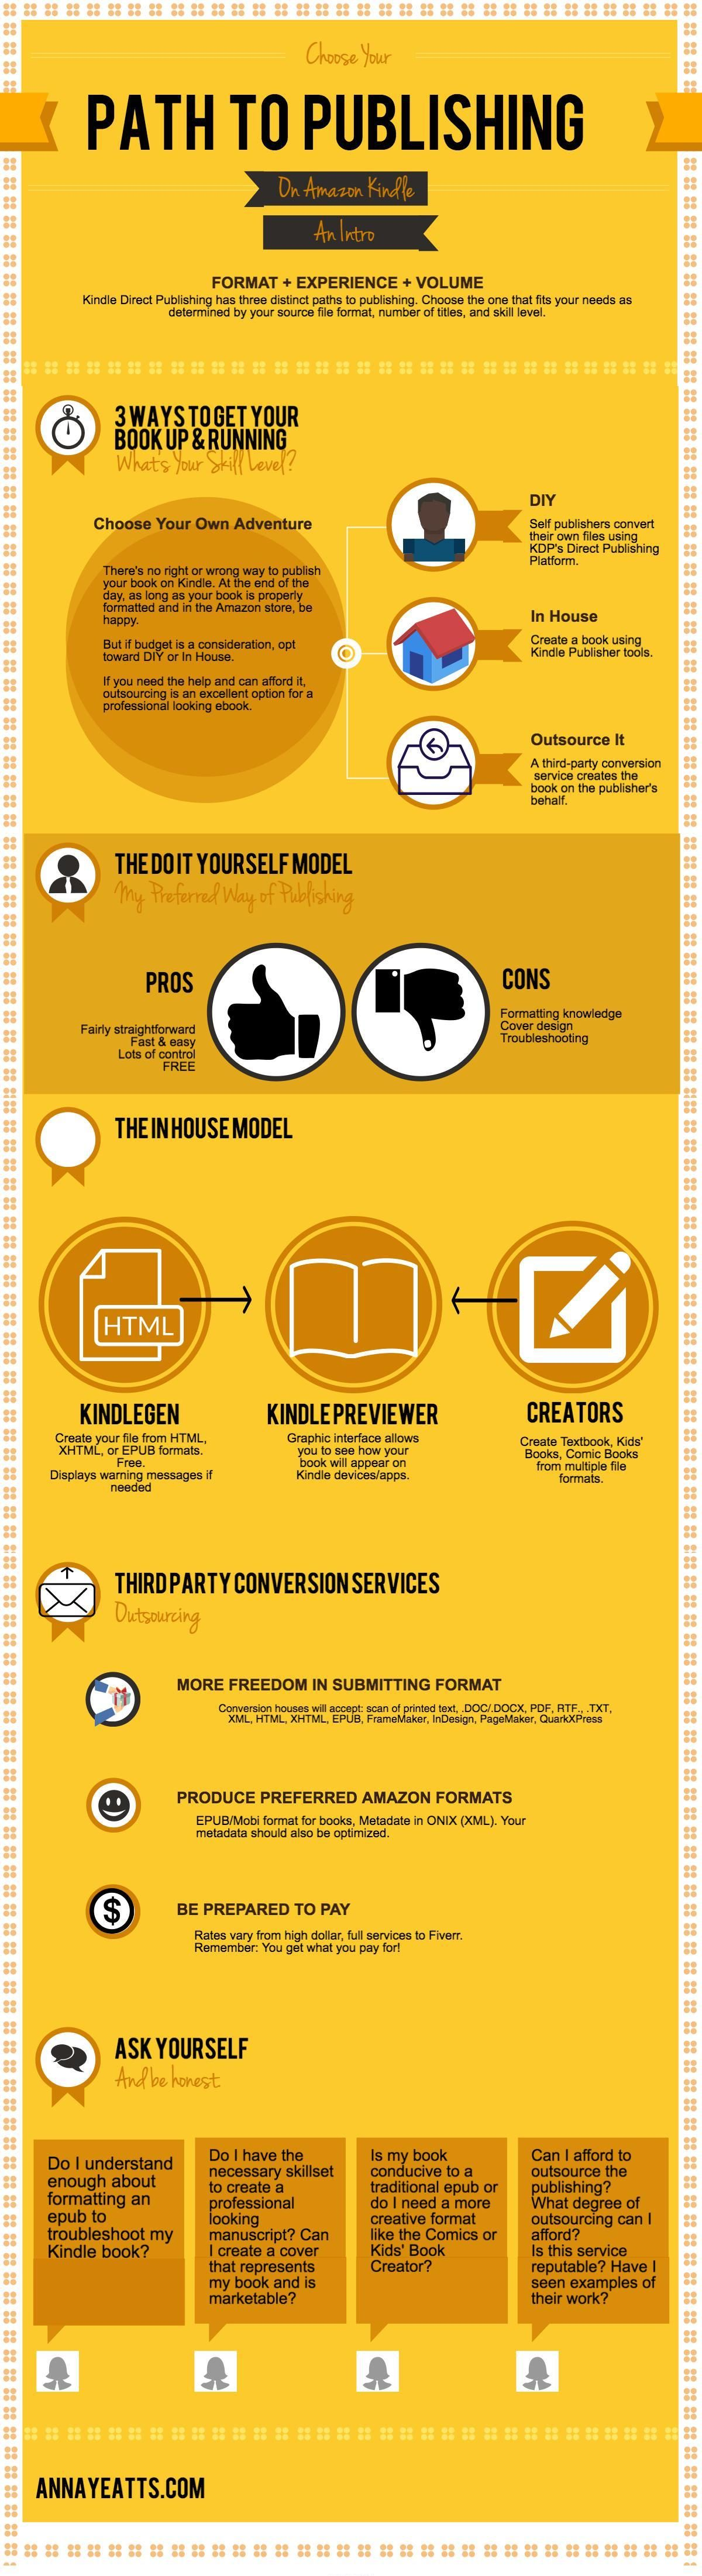 Your path to publishing with Amazon Kindle